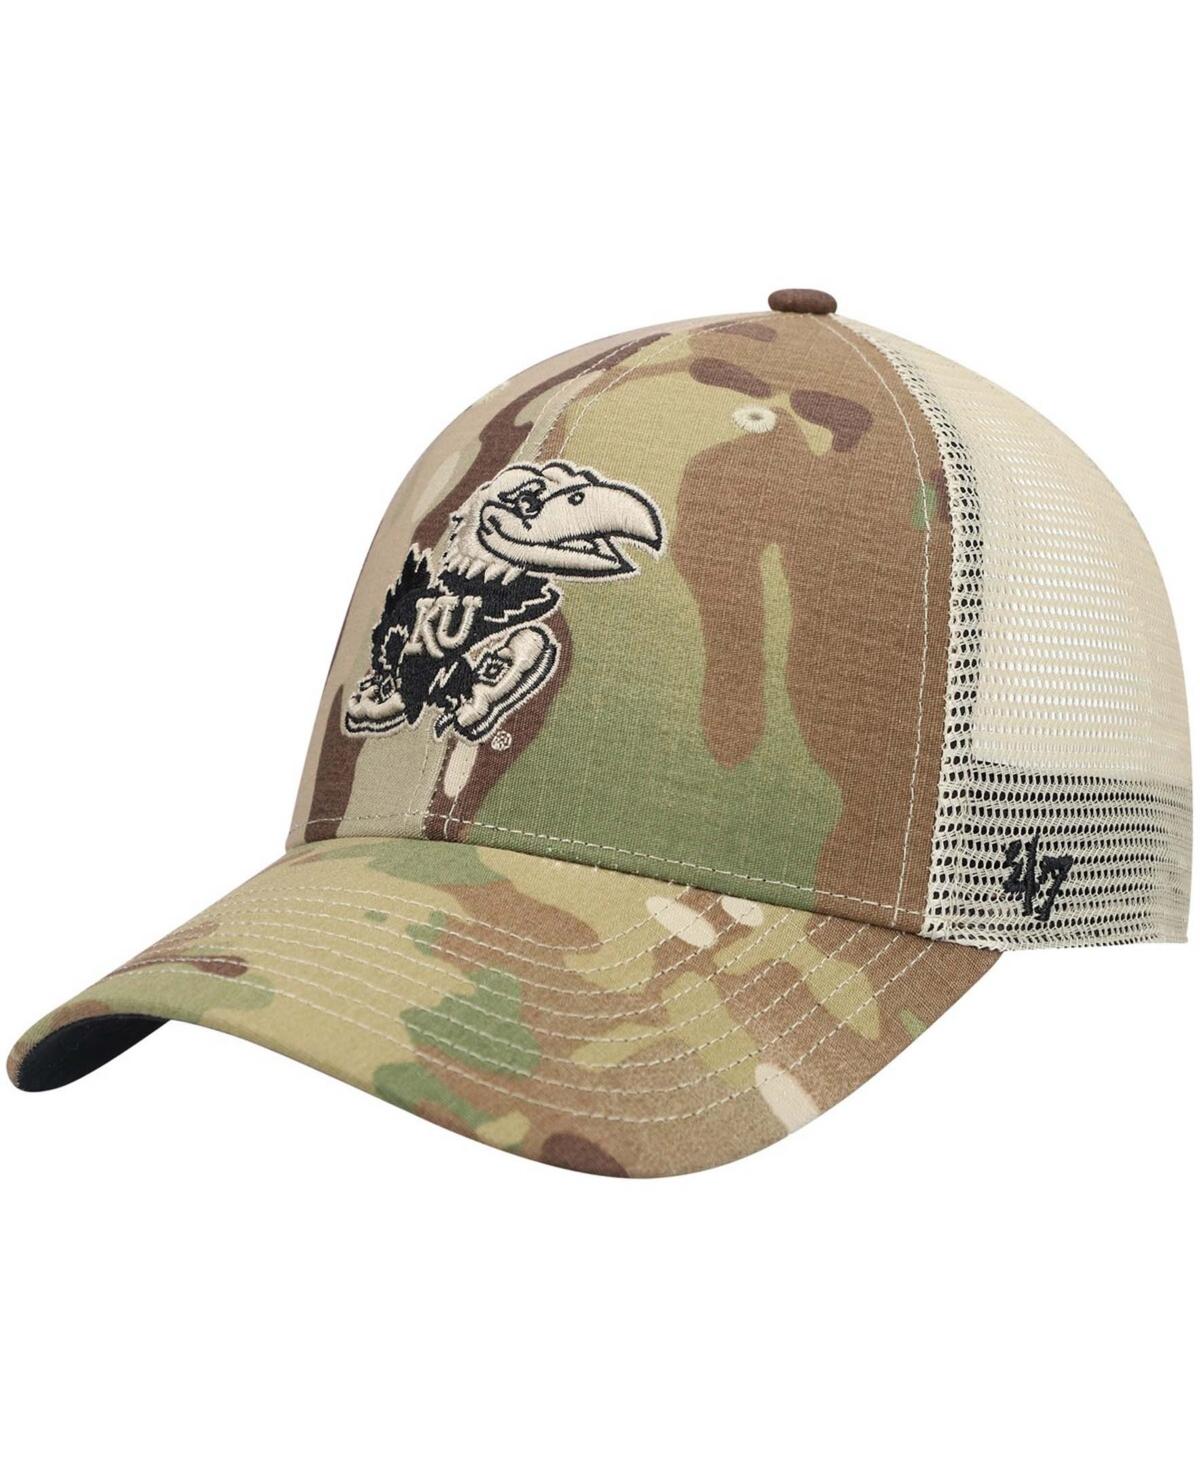 47 Mens Camo Kansas Jayhawks Oht Military Appreciation Colonel Mvp Adjustable Snapback Hat